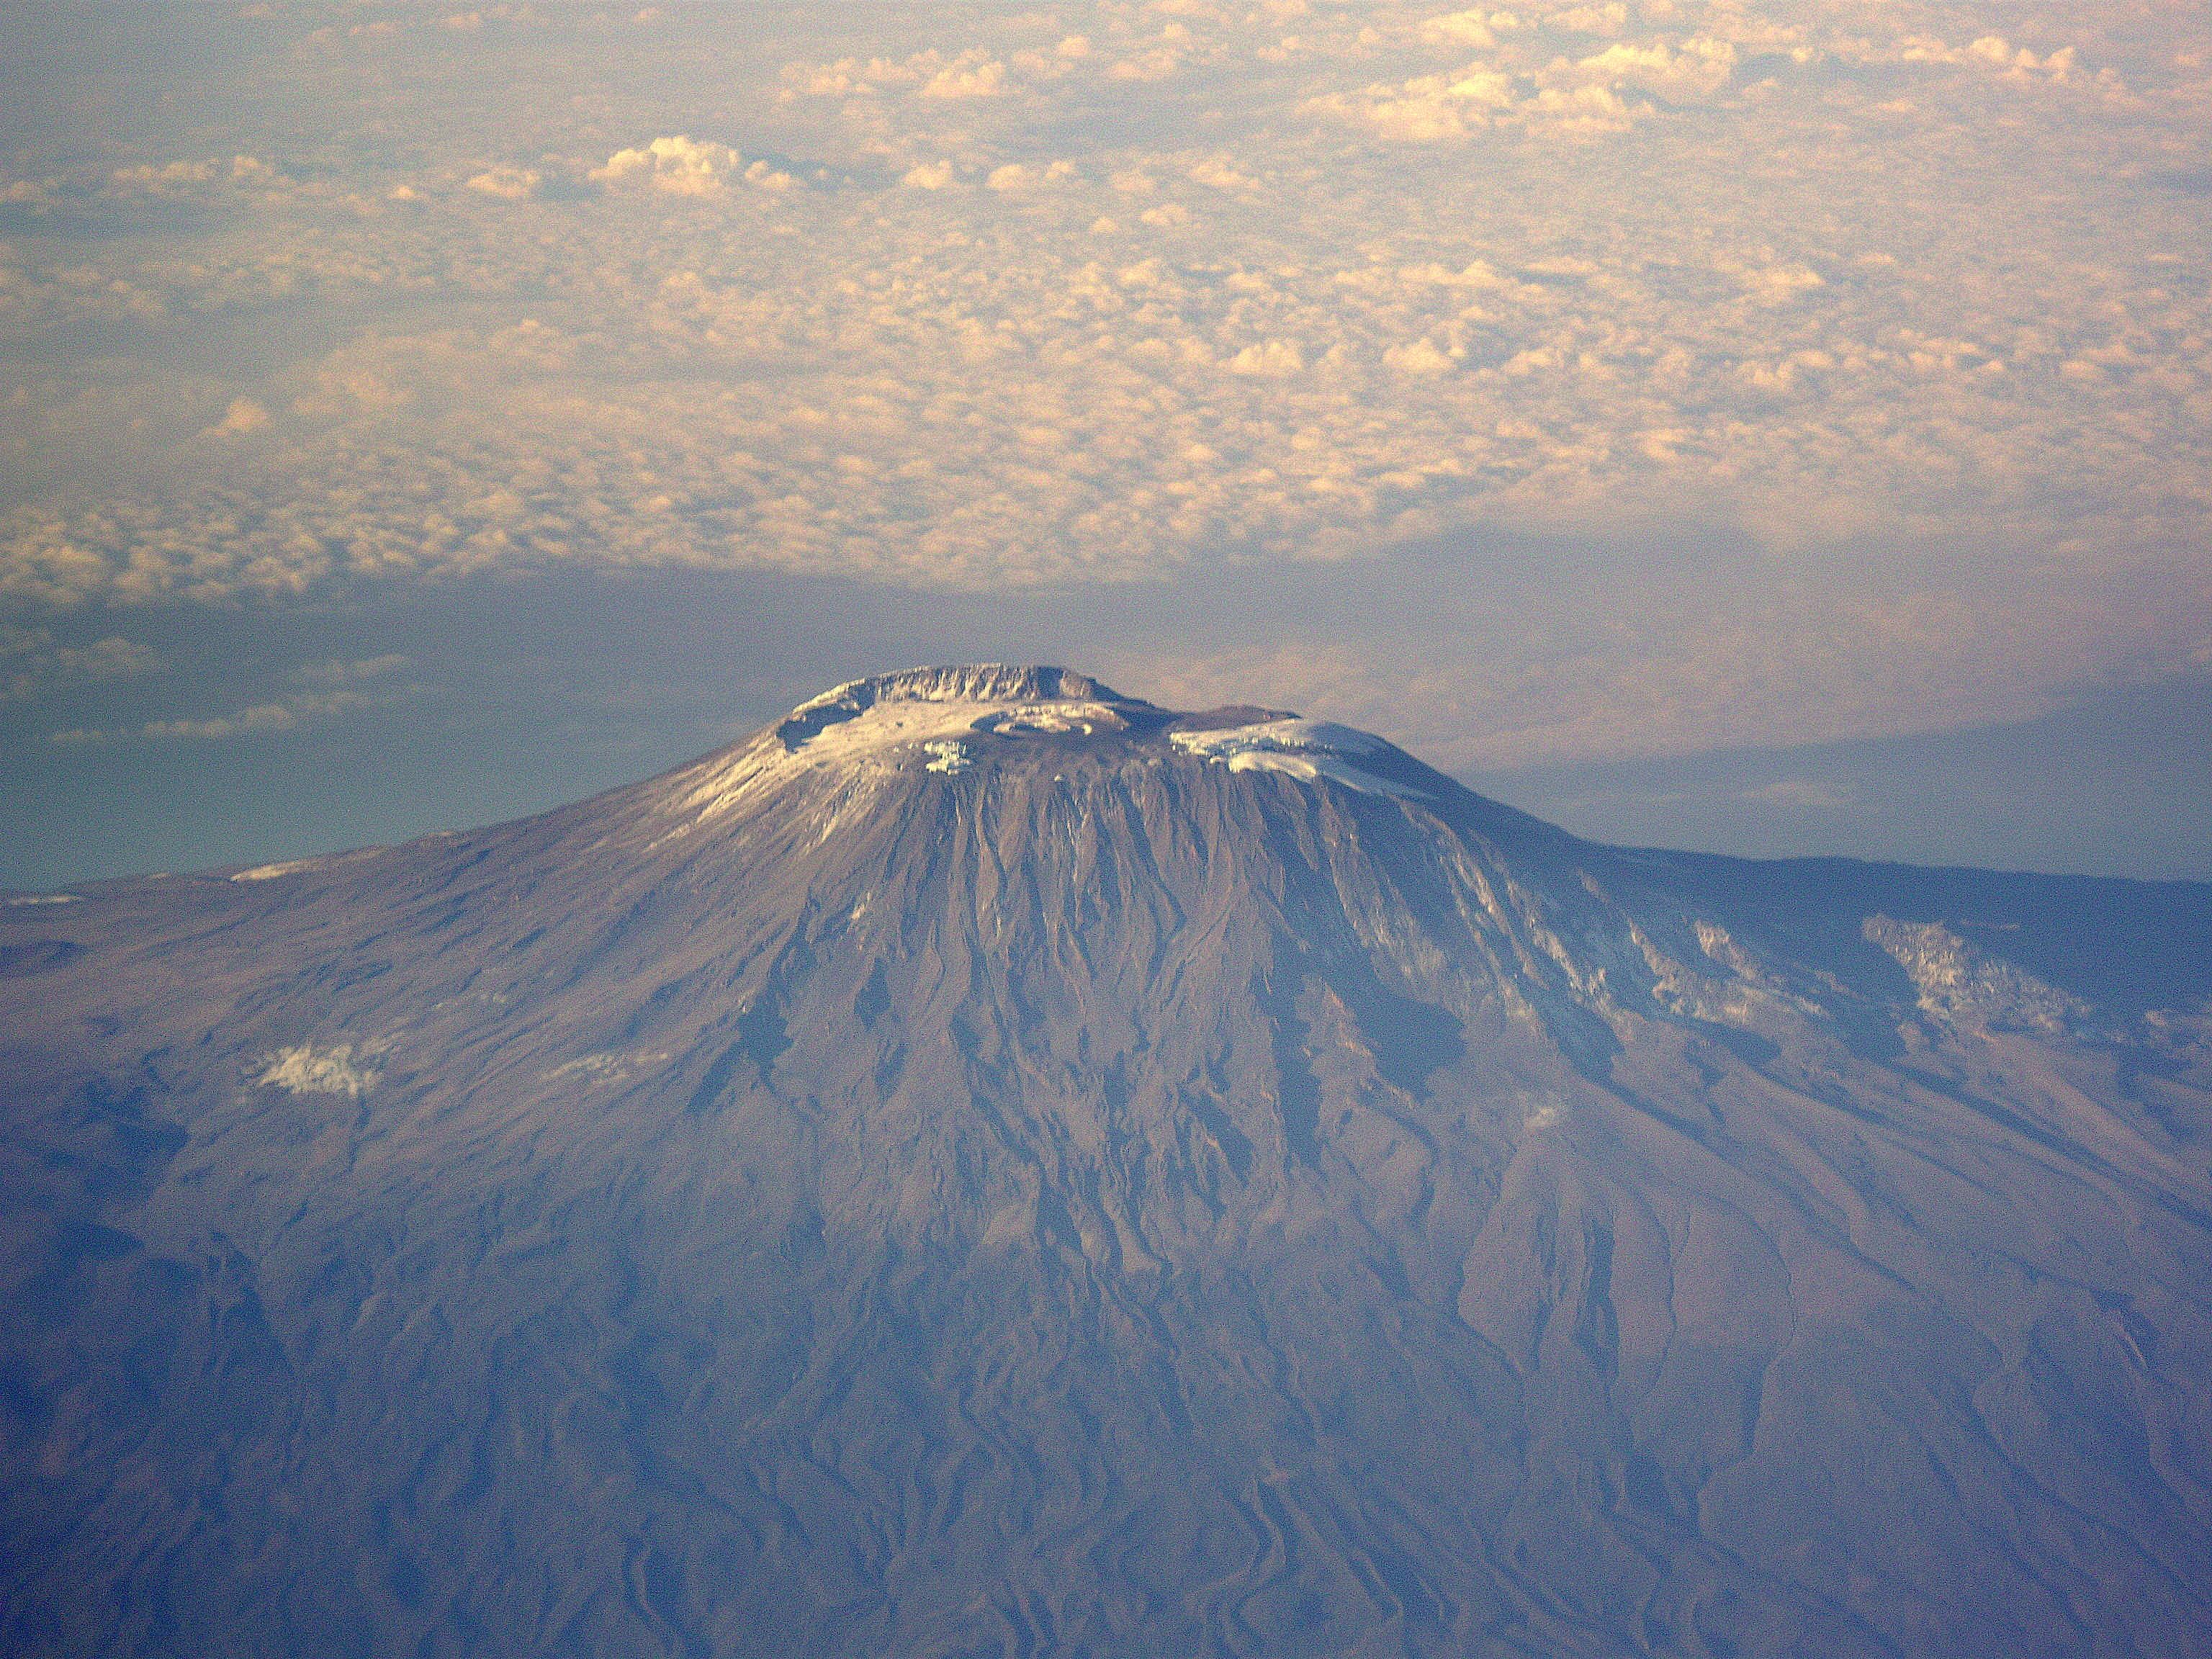 ascenso al Kilimanjaro